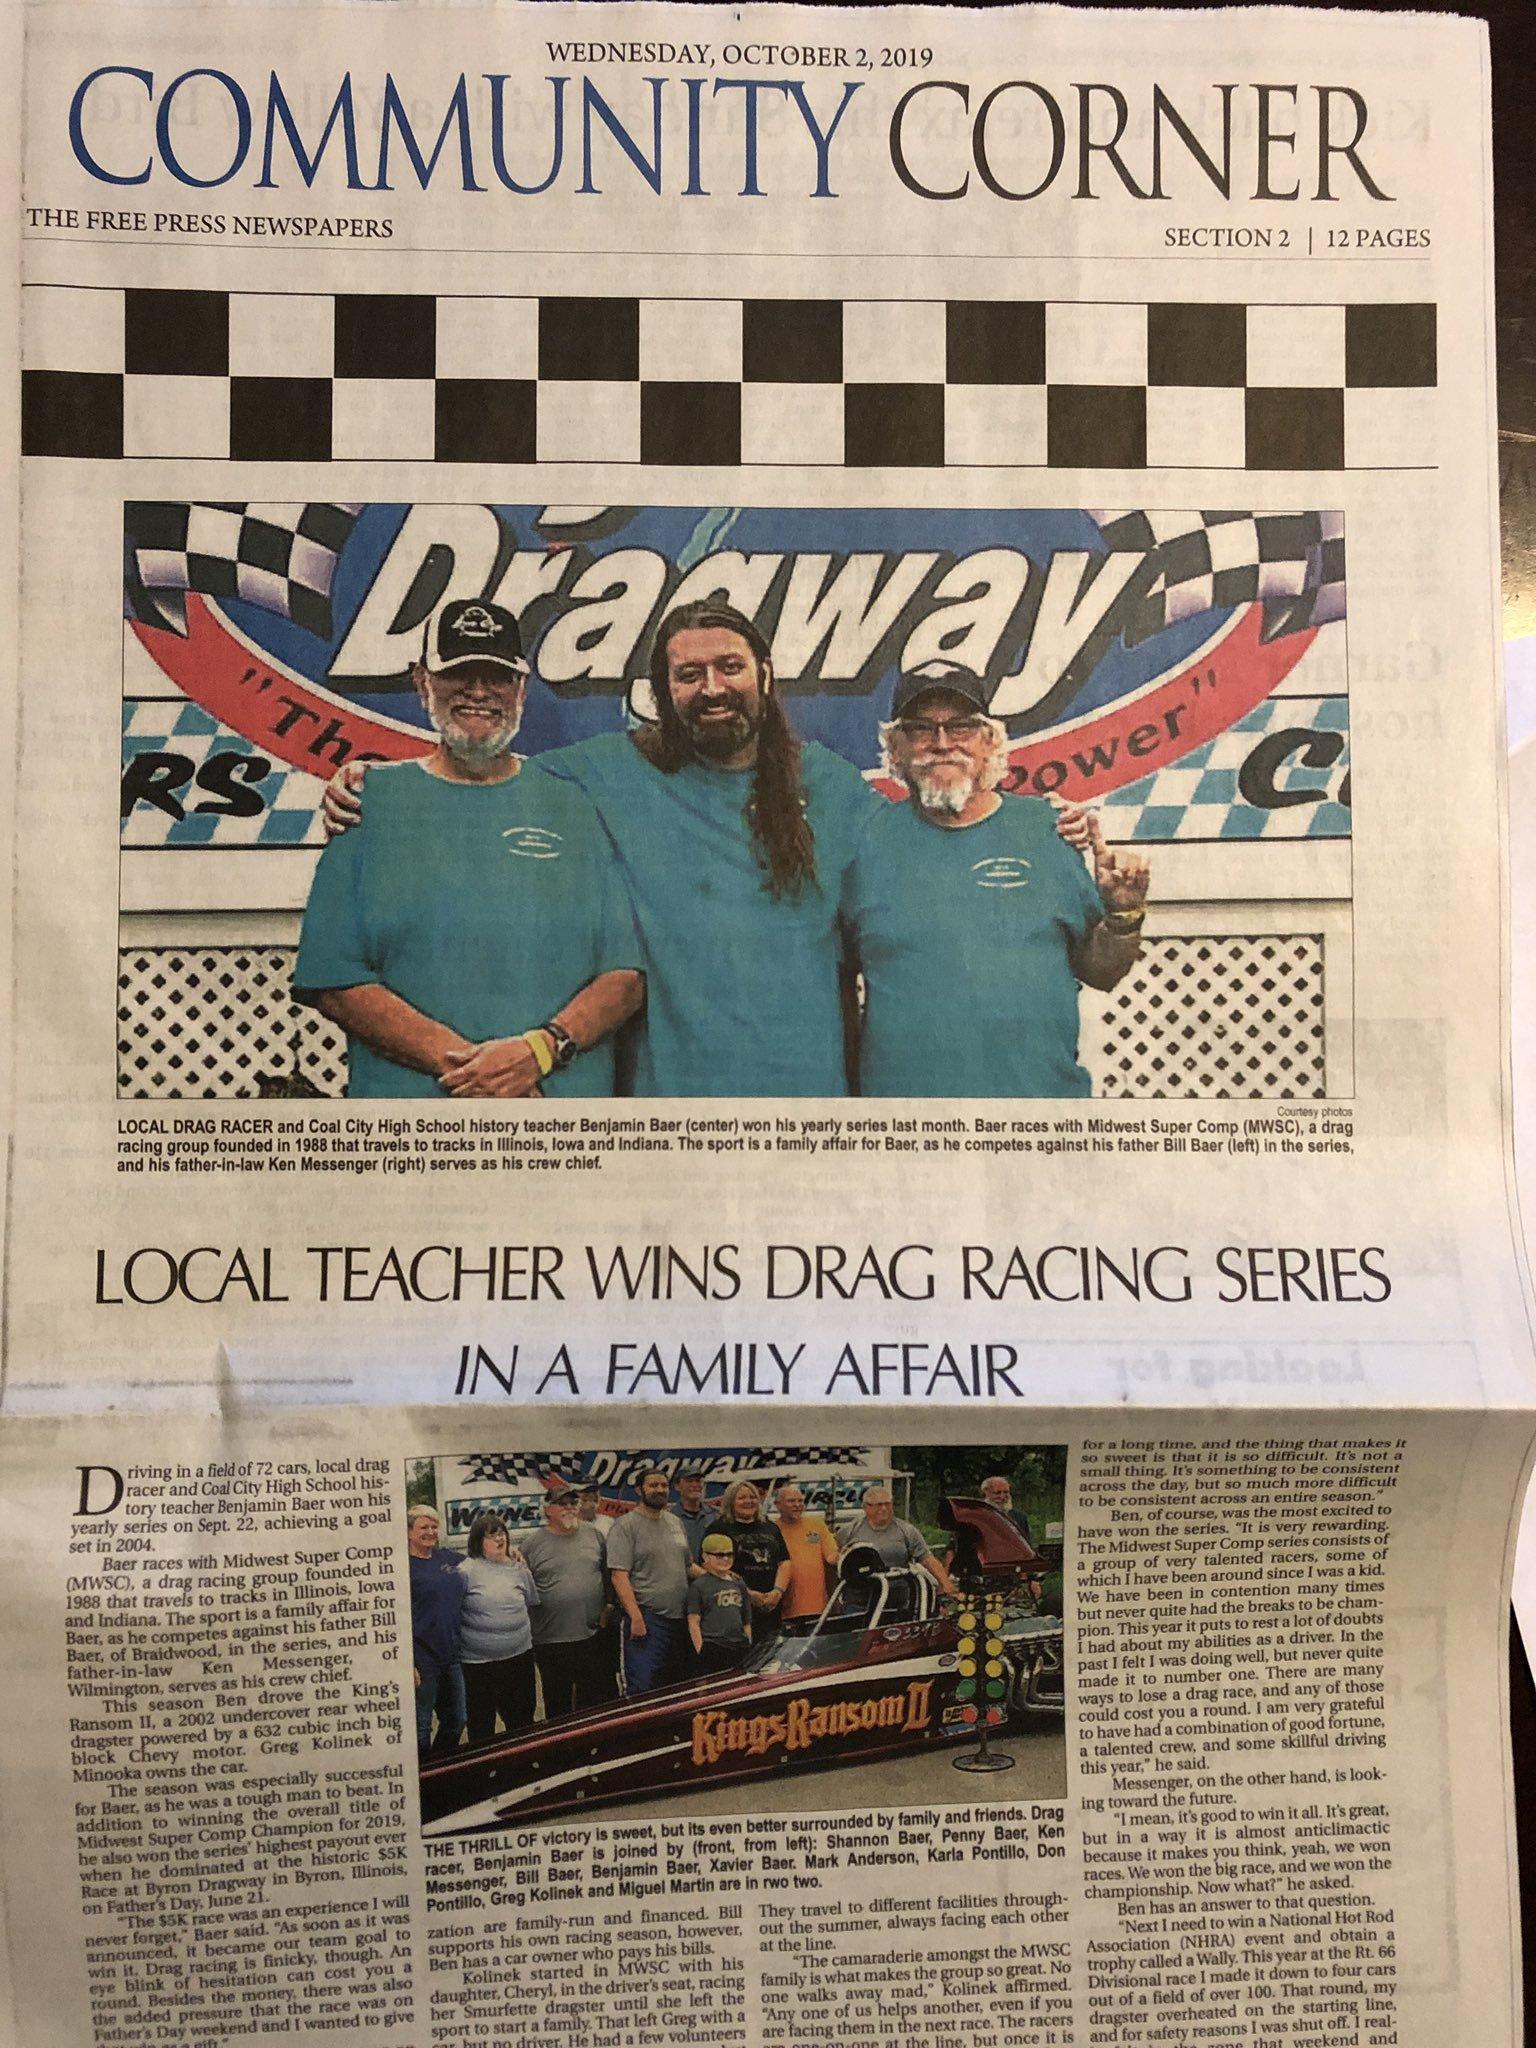 A newspaper that says local teacher wins drag racing series.